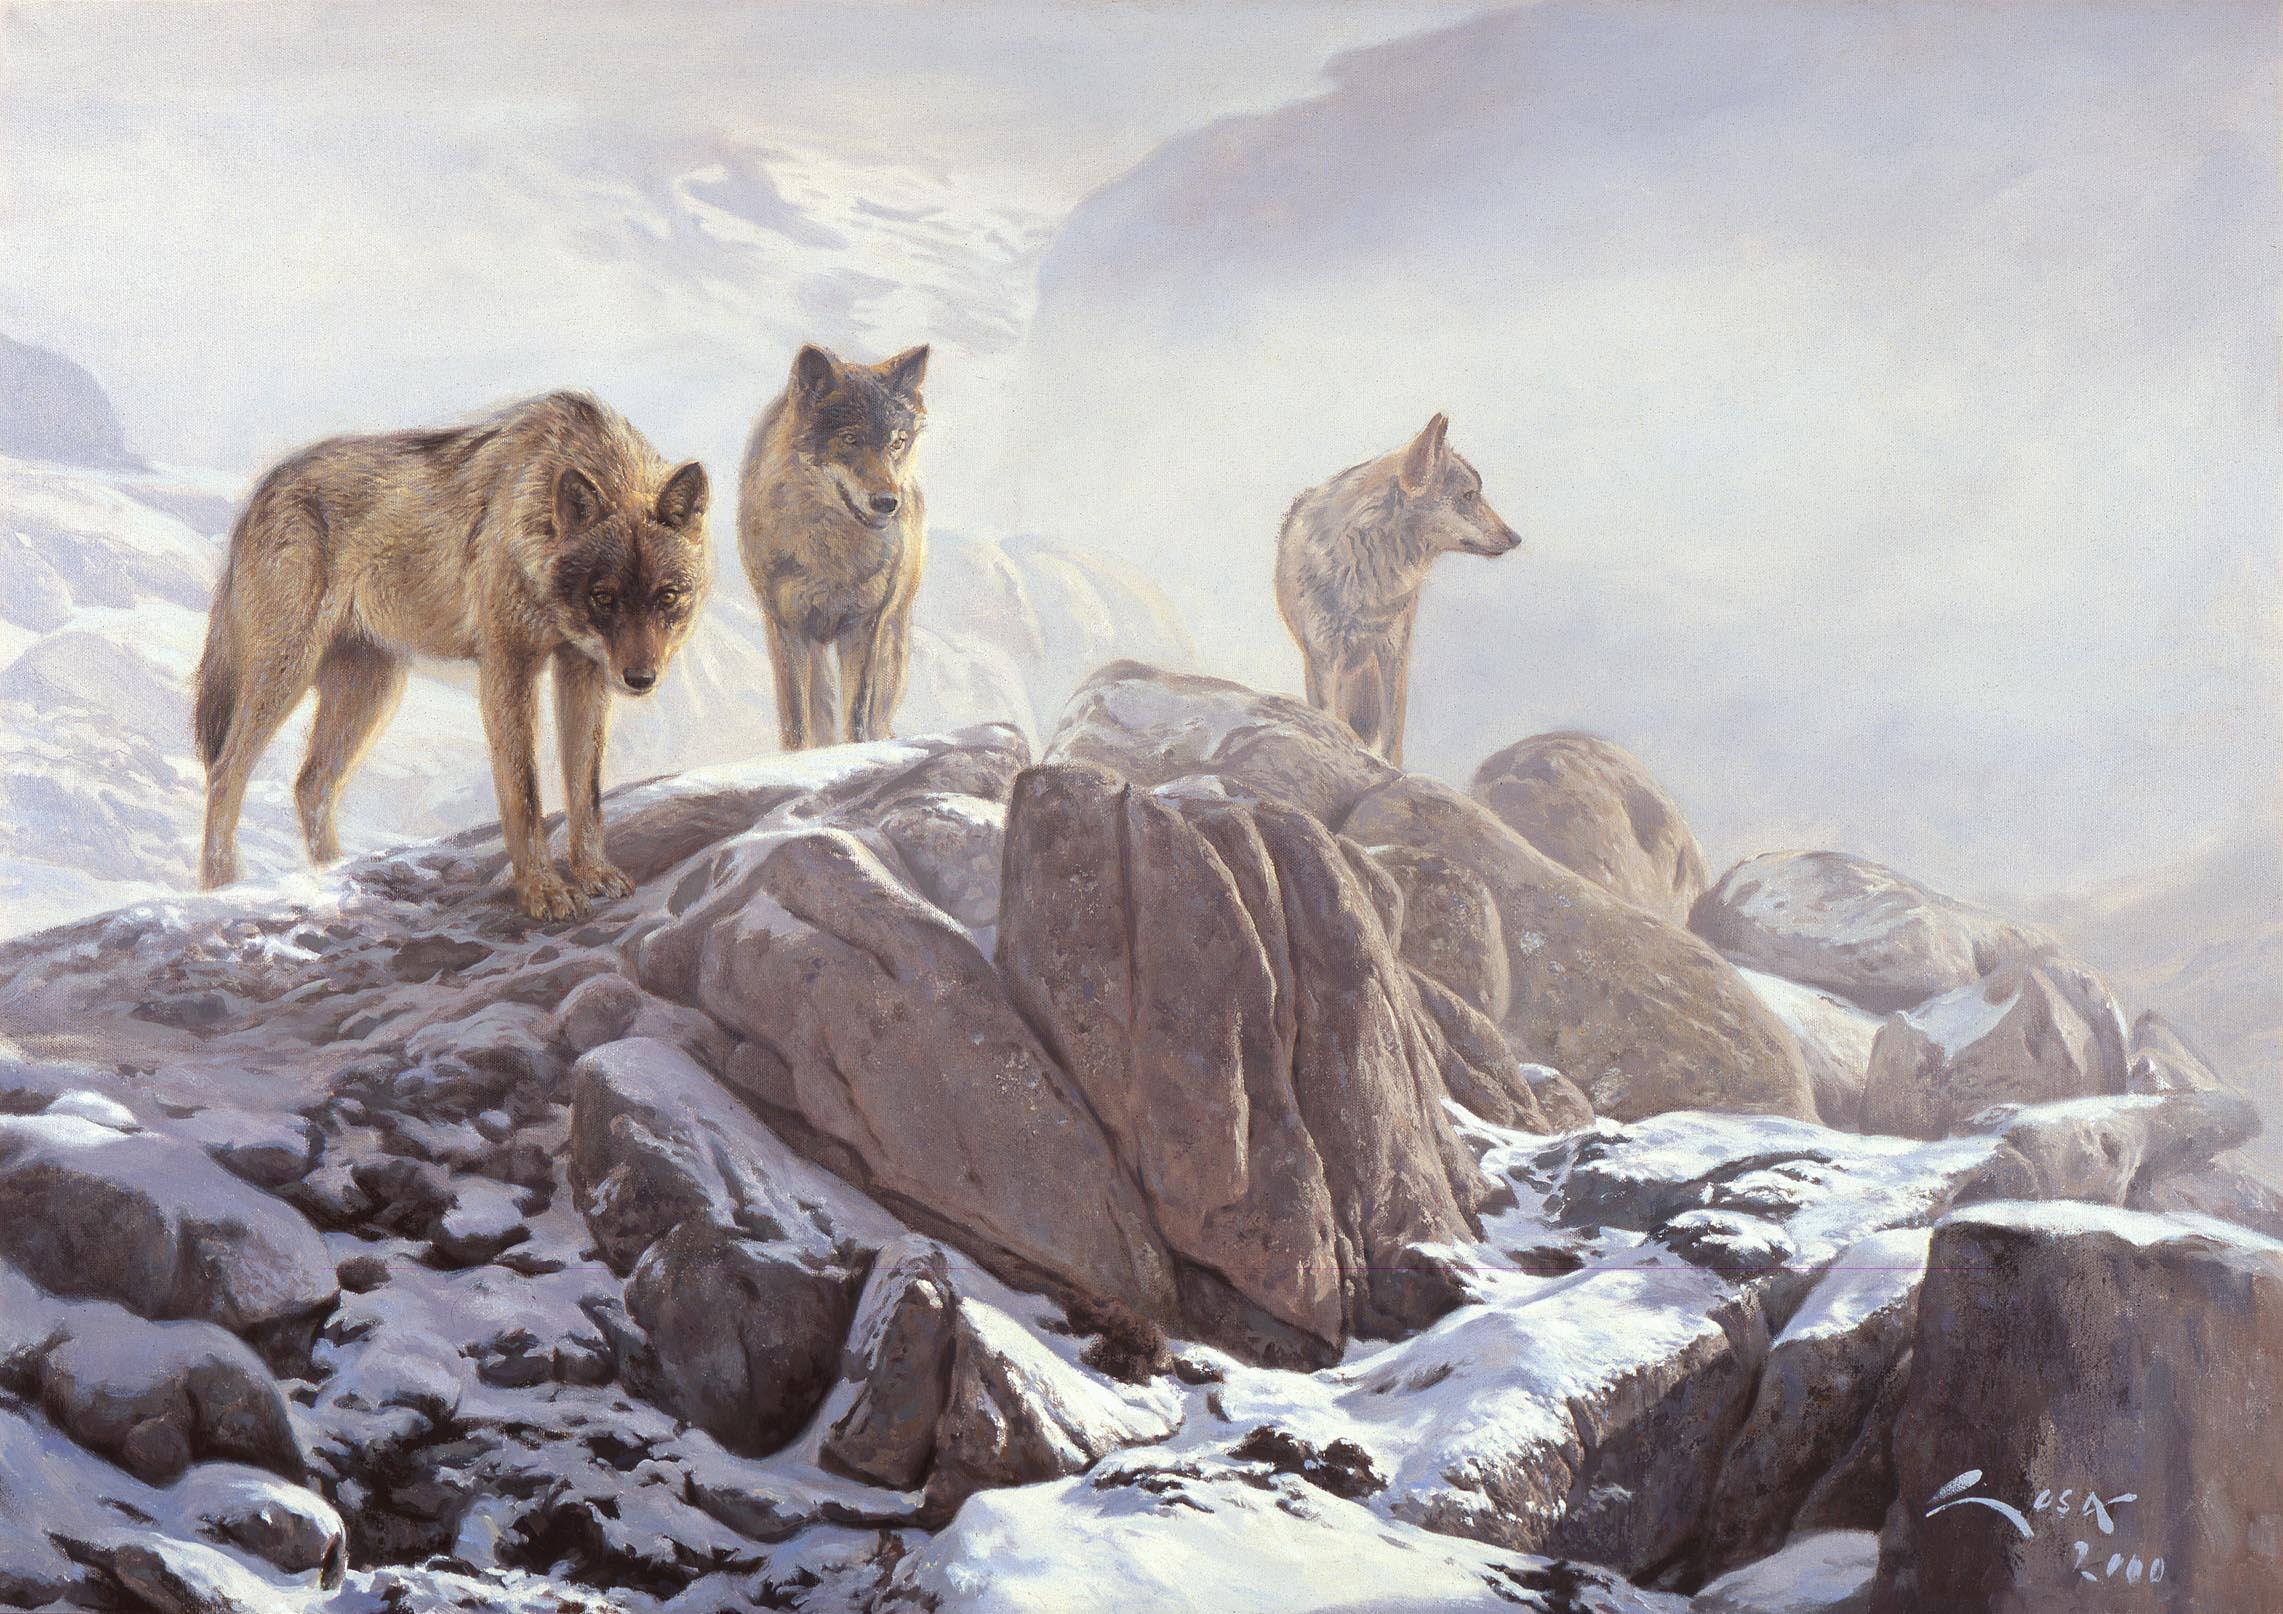 Cuadros De Lobo Canis Lupus La Manada Sosa Pintura Naturaleza